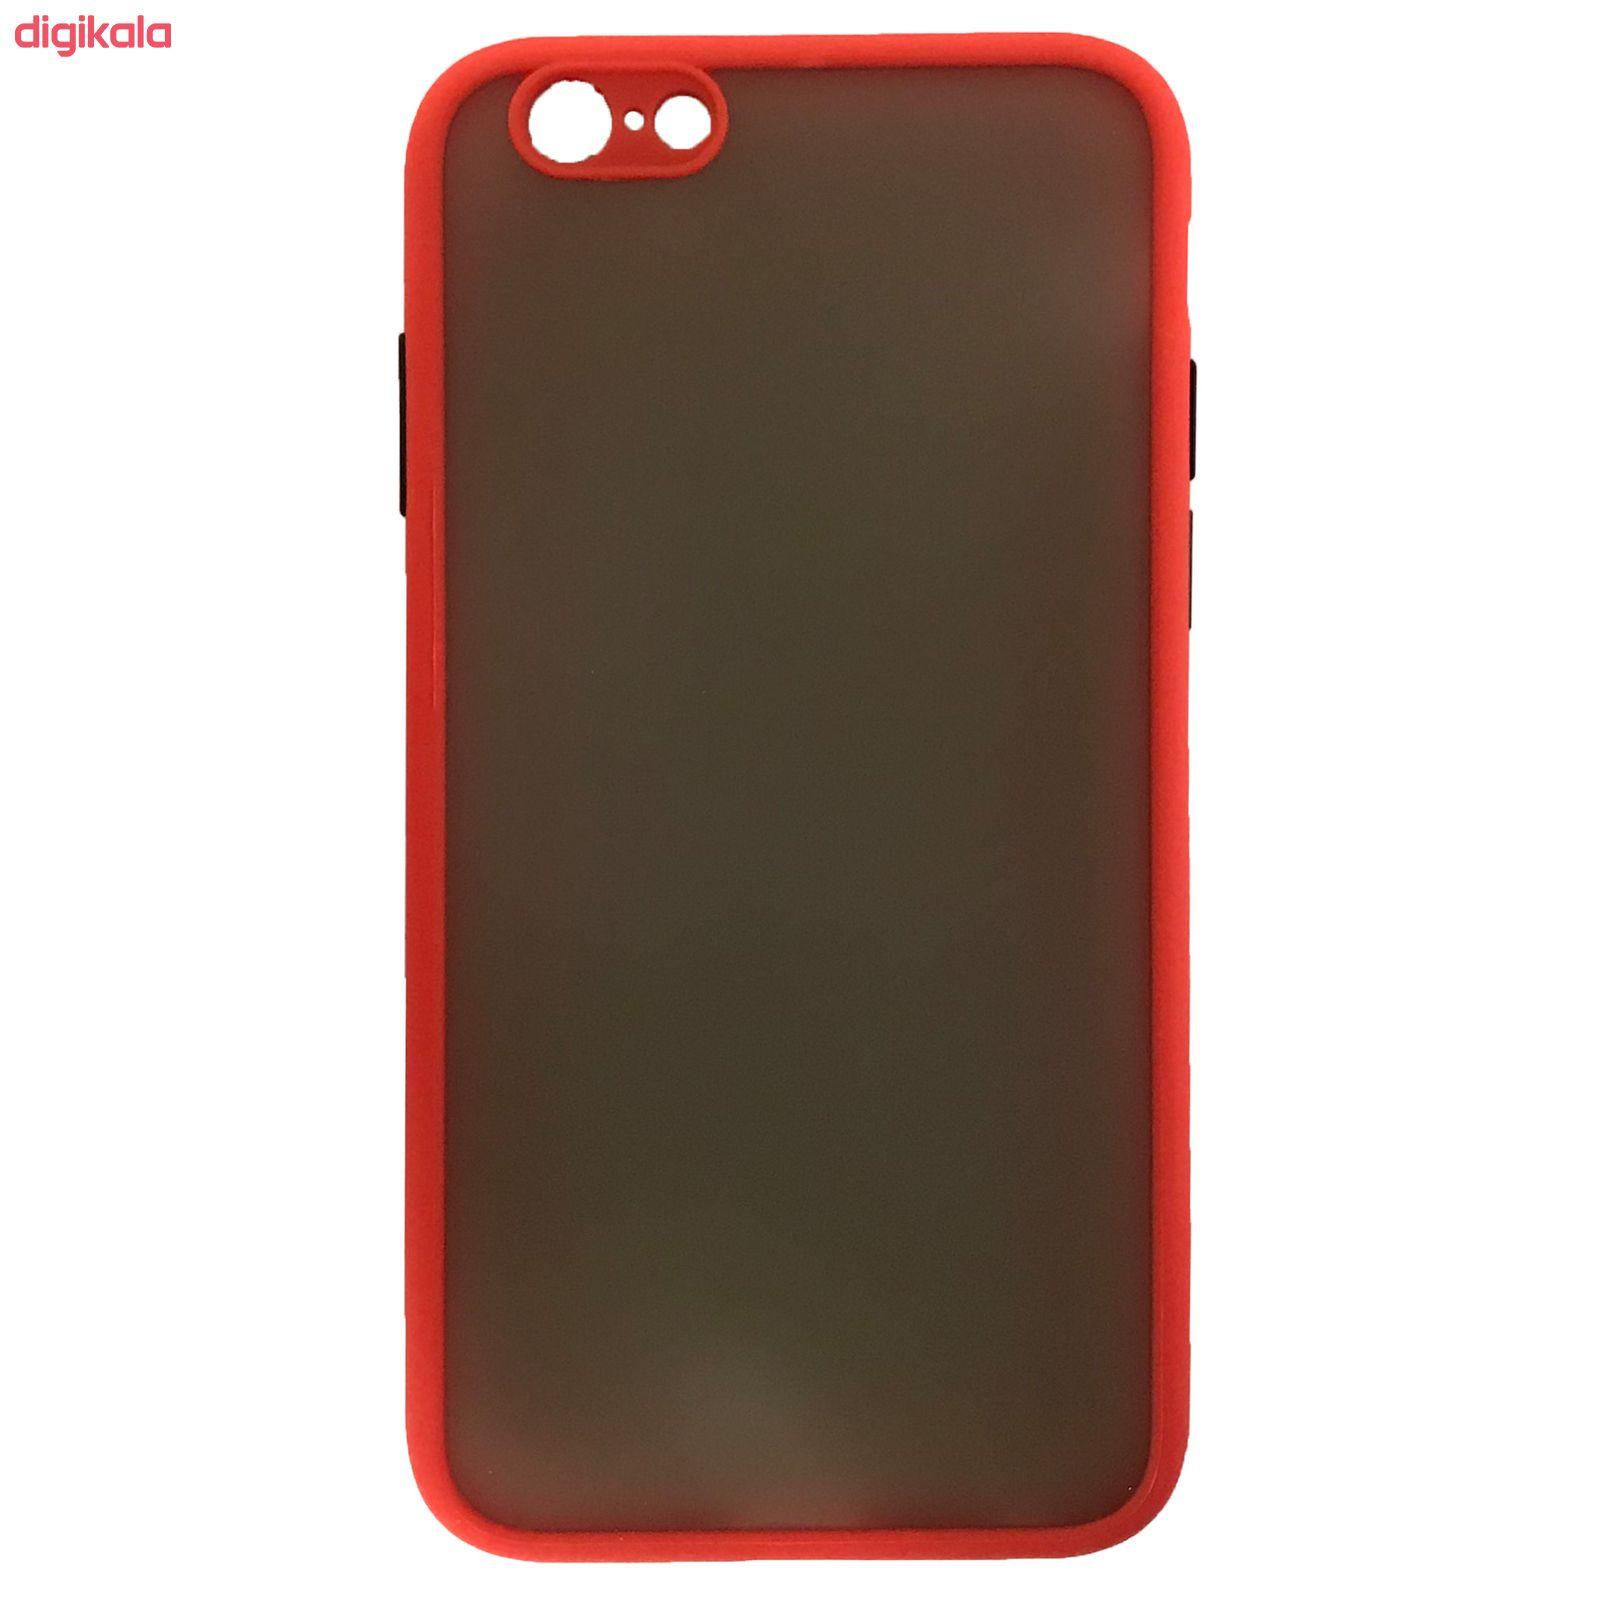 کاور مدل PM-6s مناسب برای گوشی موبایل اپل iPhone 6/6s main 1 1